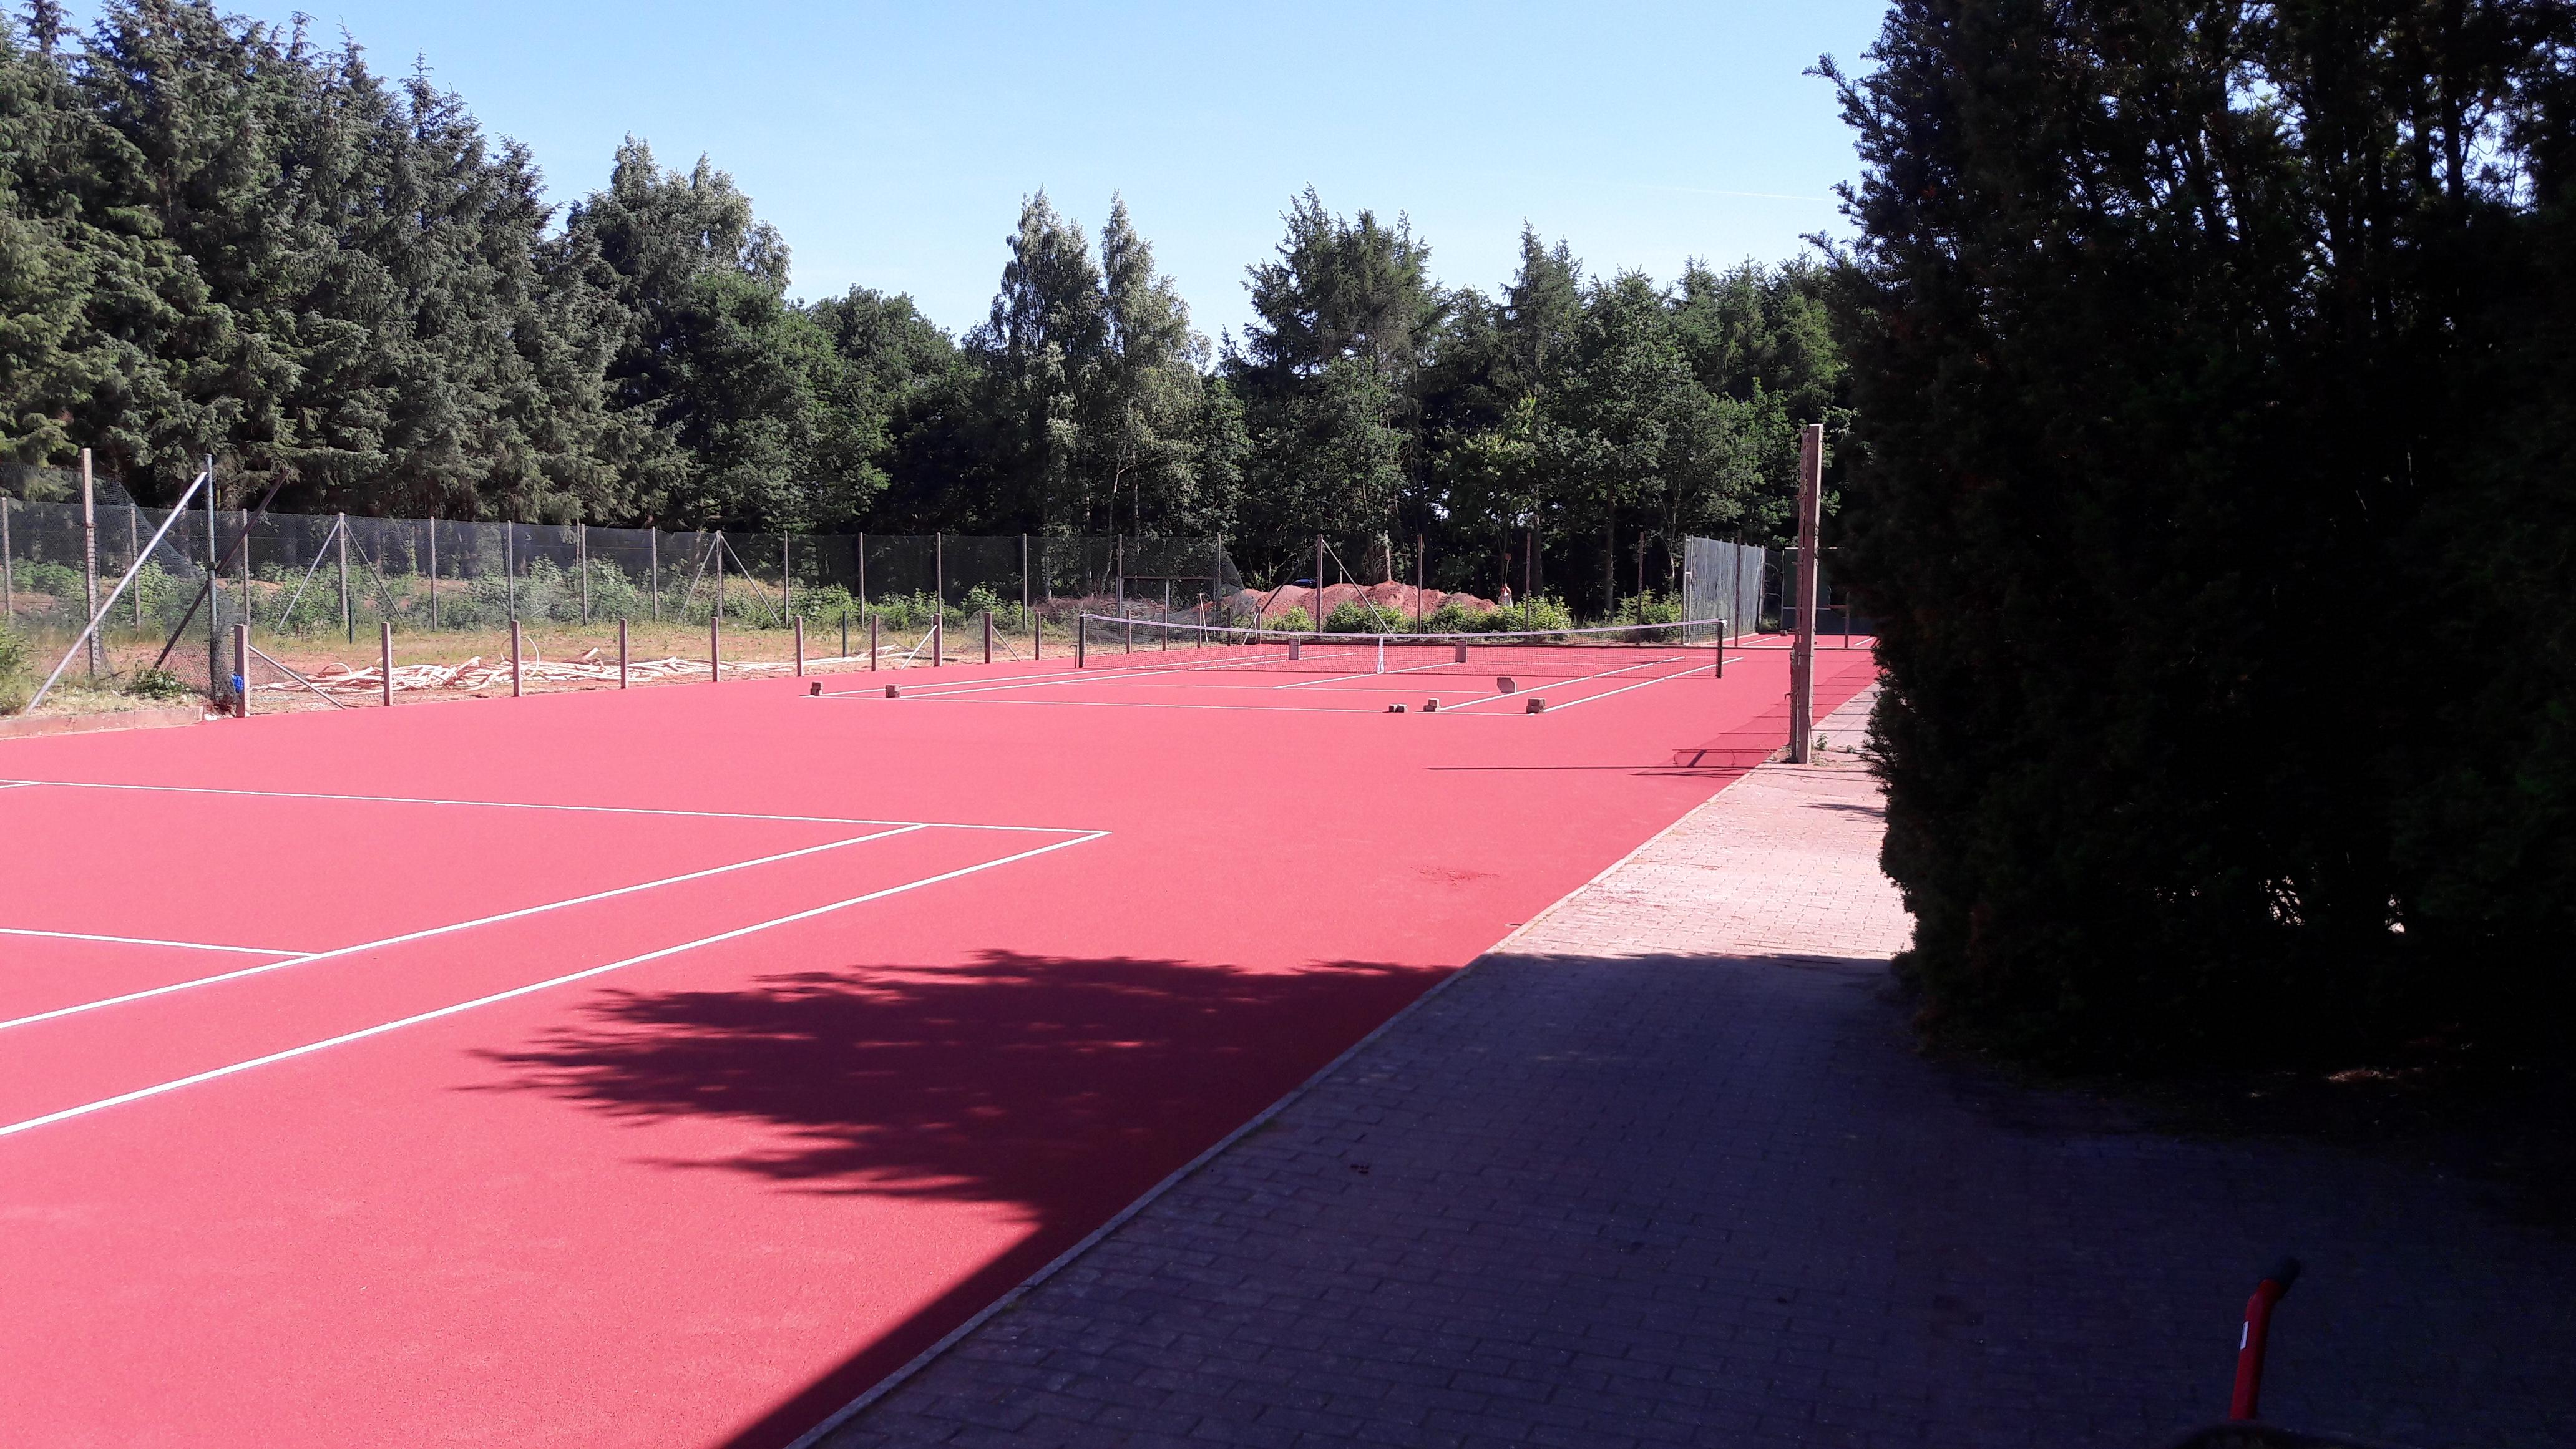 Platz 1 Tennis-Force